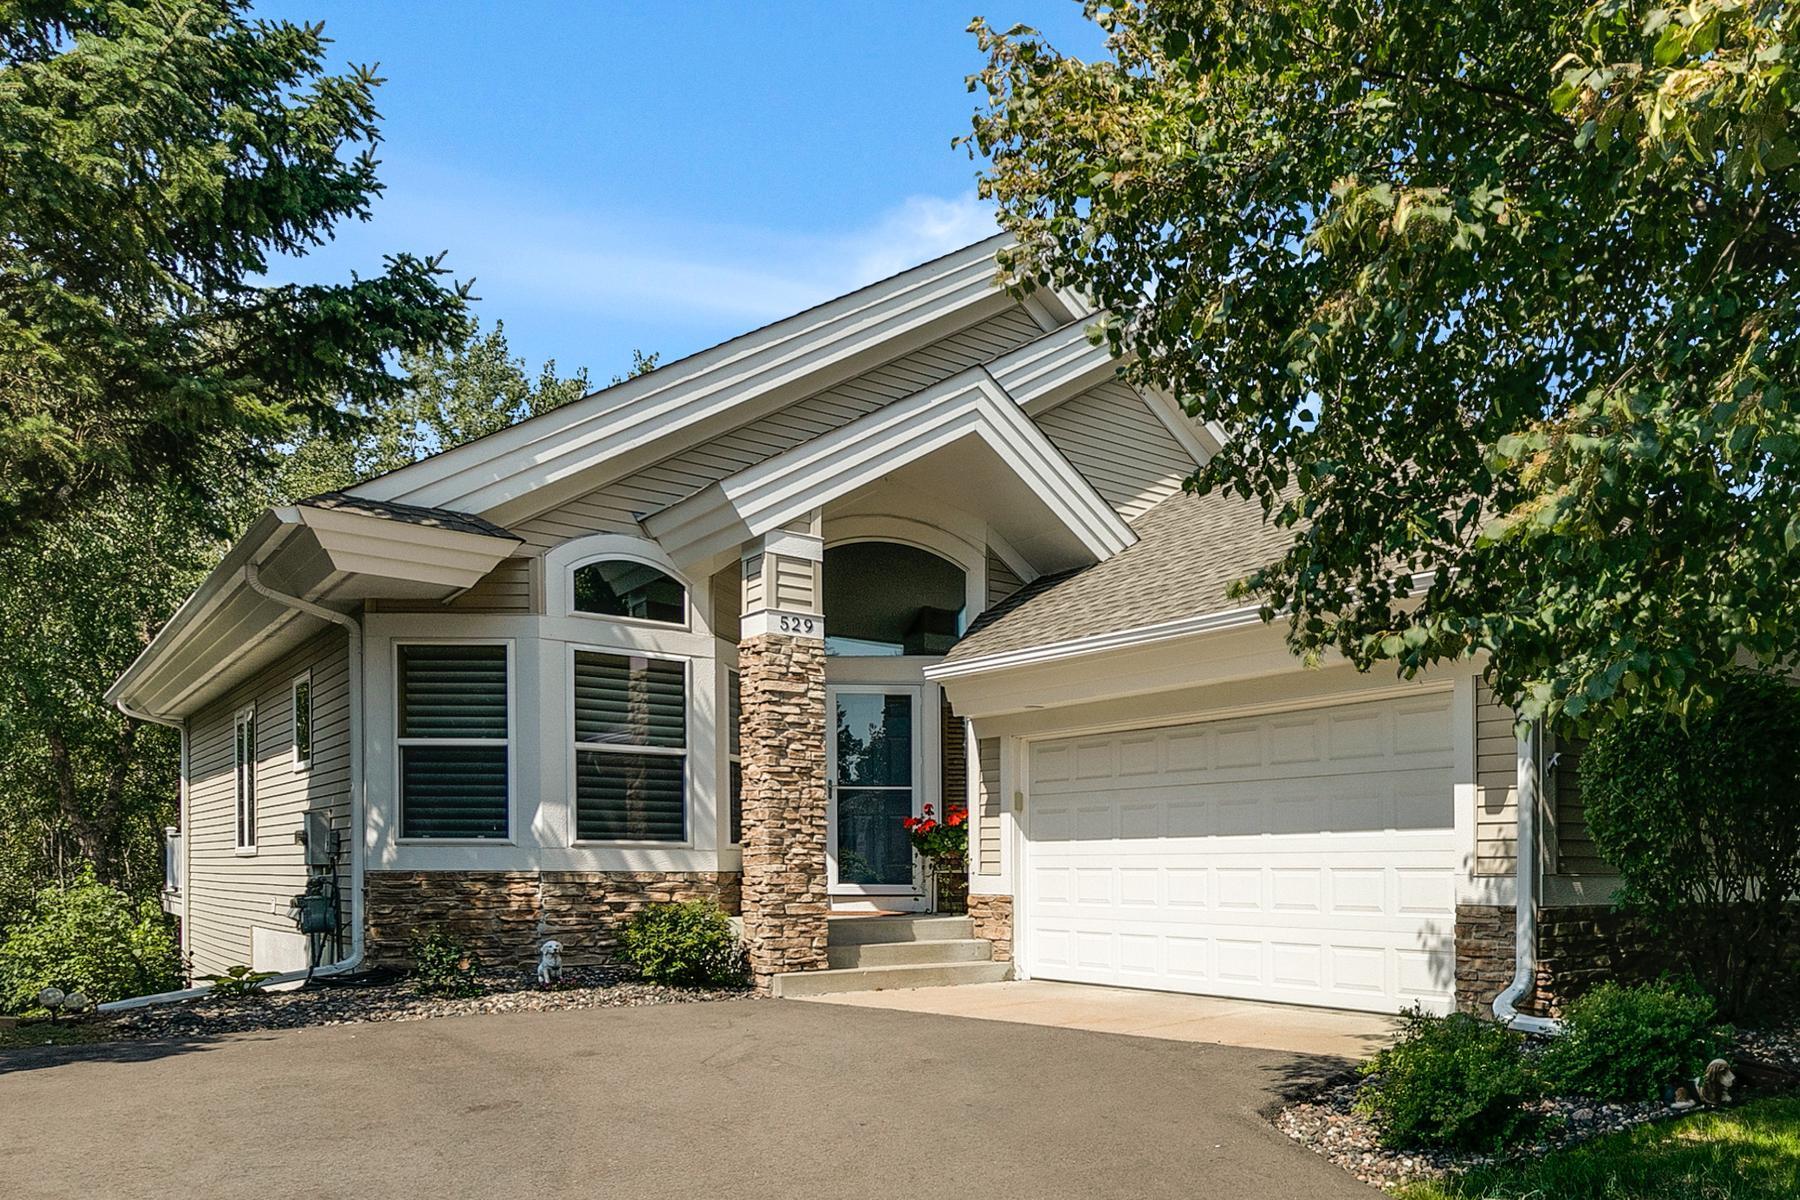 529 Wildflower Property Photo - Burnsville, MN real estate listing